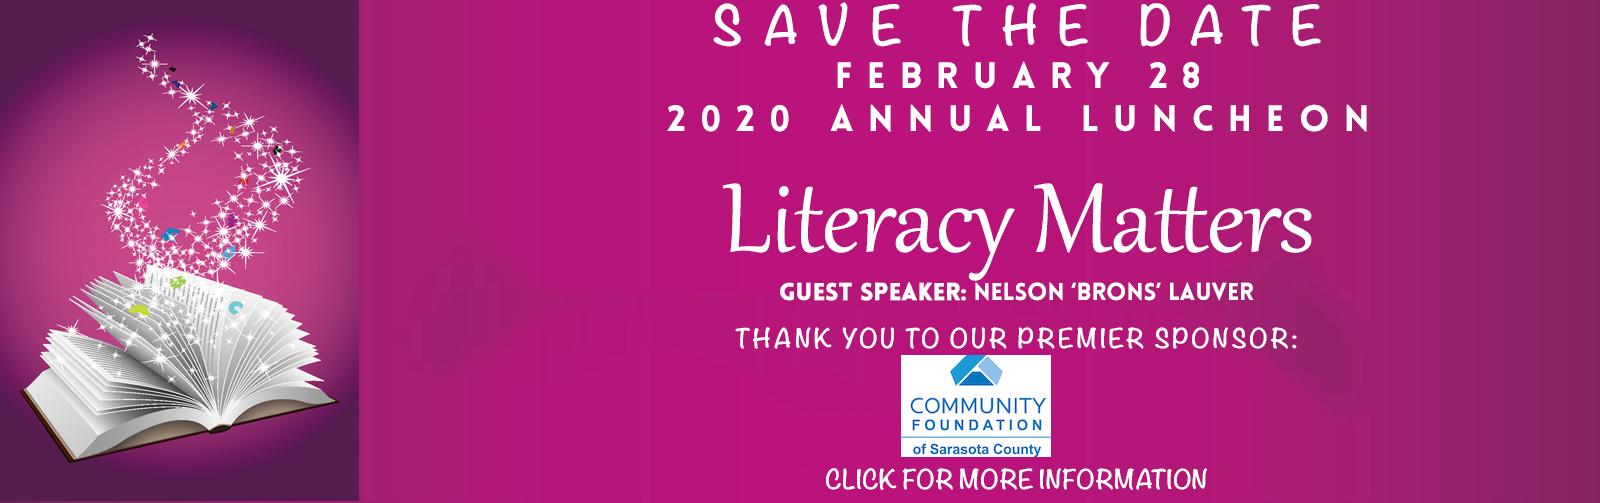 slide_literacy matters-2020-luncheon-sponsor